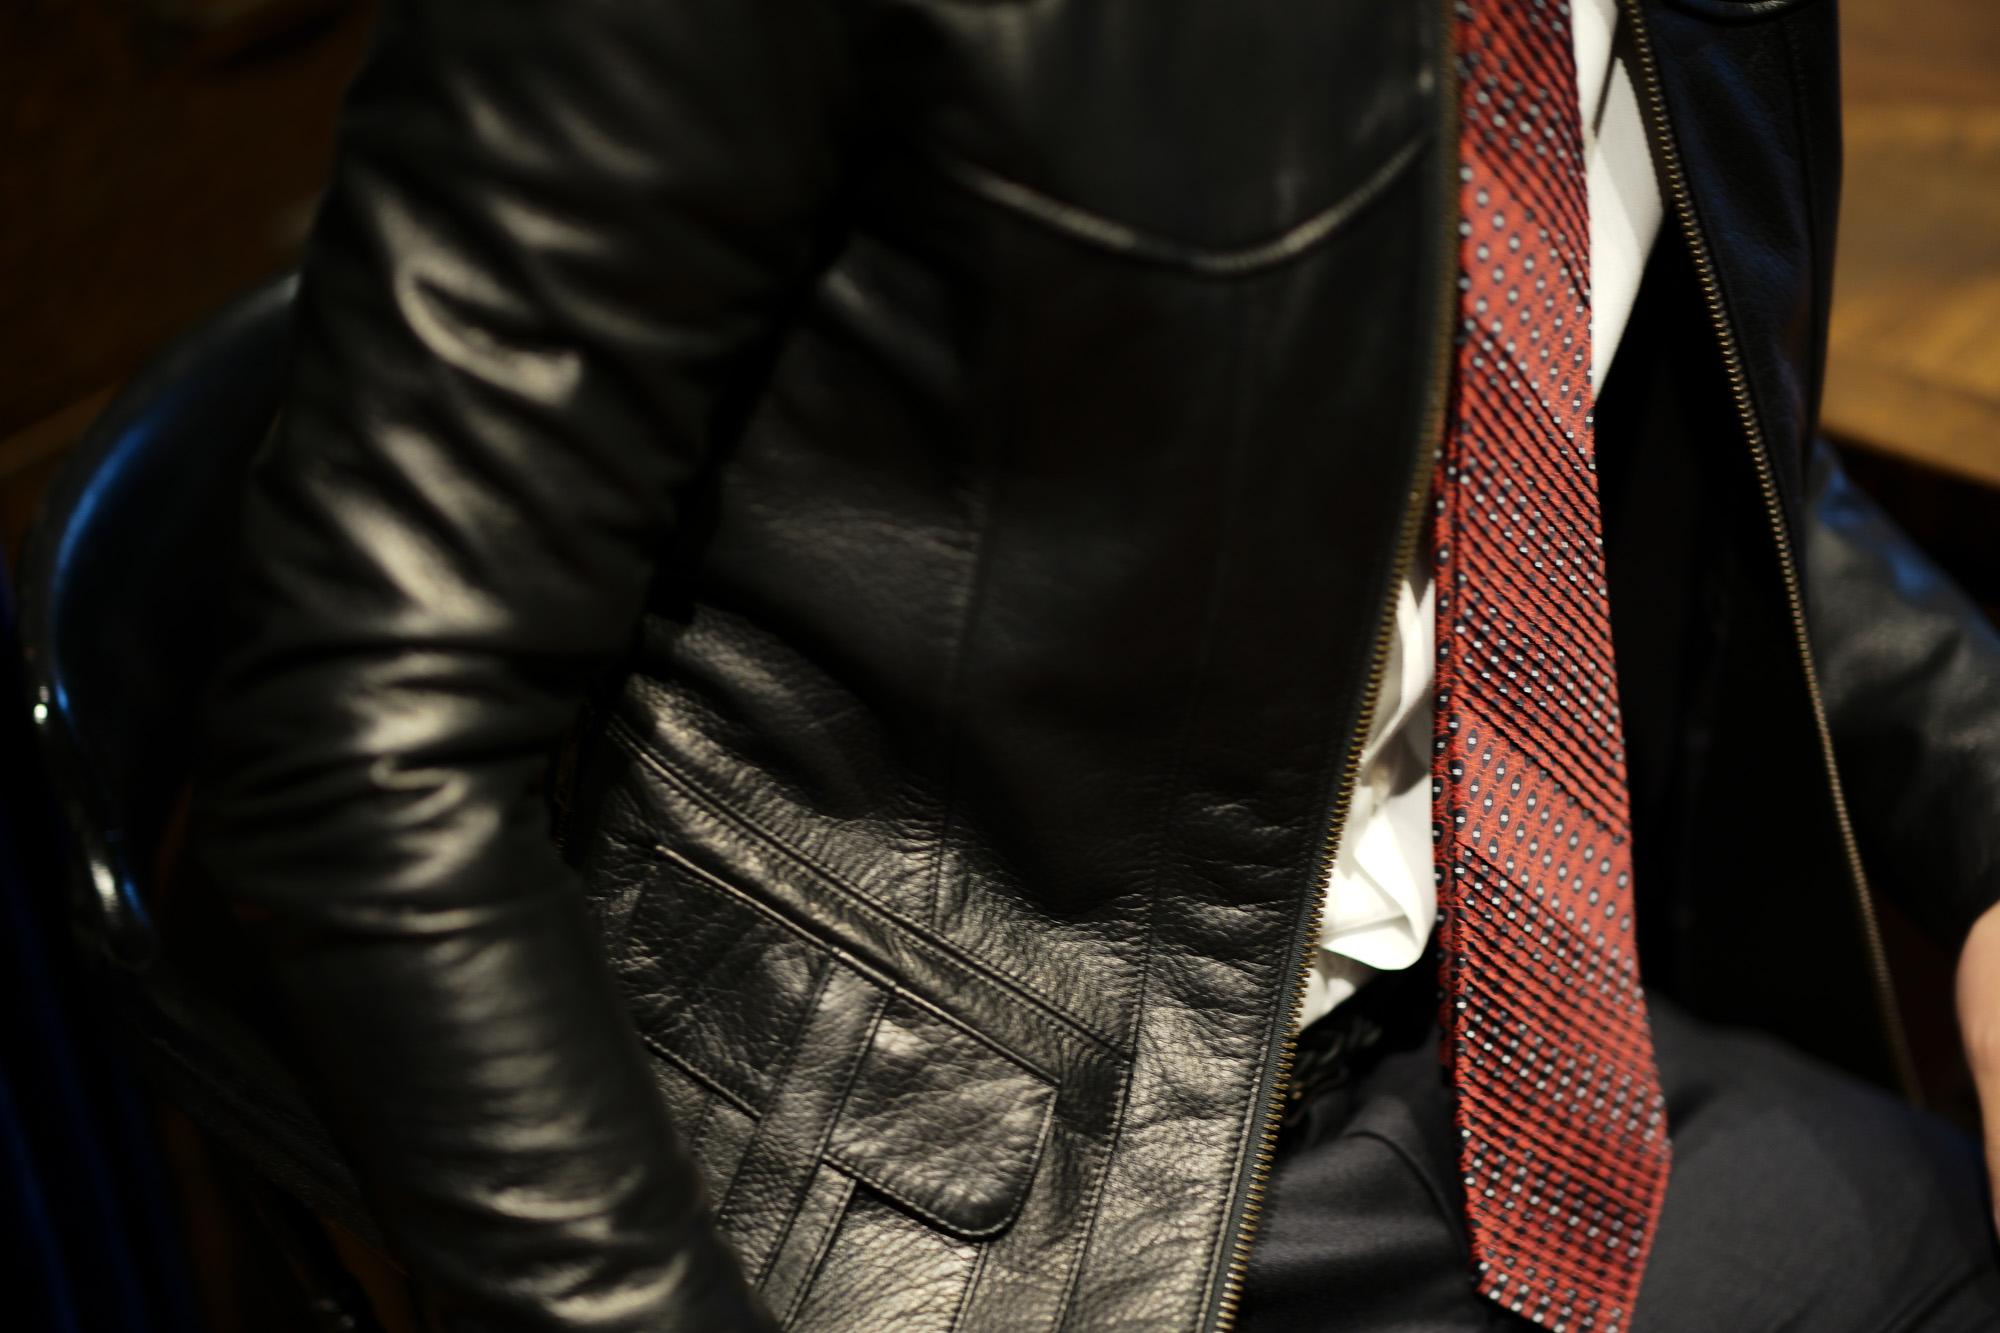 STEFANO RICCI (ステファノリッチ) PLEATS TIE (プリーツタイ) シルク プリント プリーツ ネクタイ RED (レッド) Made in italy (イタリア製) 2018 秋冬新作 stefaboricci 愛知 名古屋 altoediritto アルトエデリット タイ